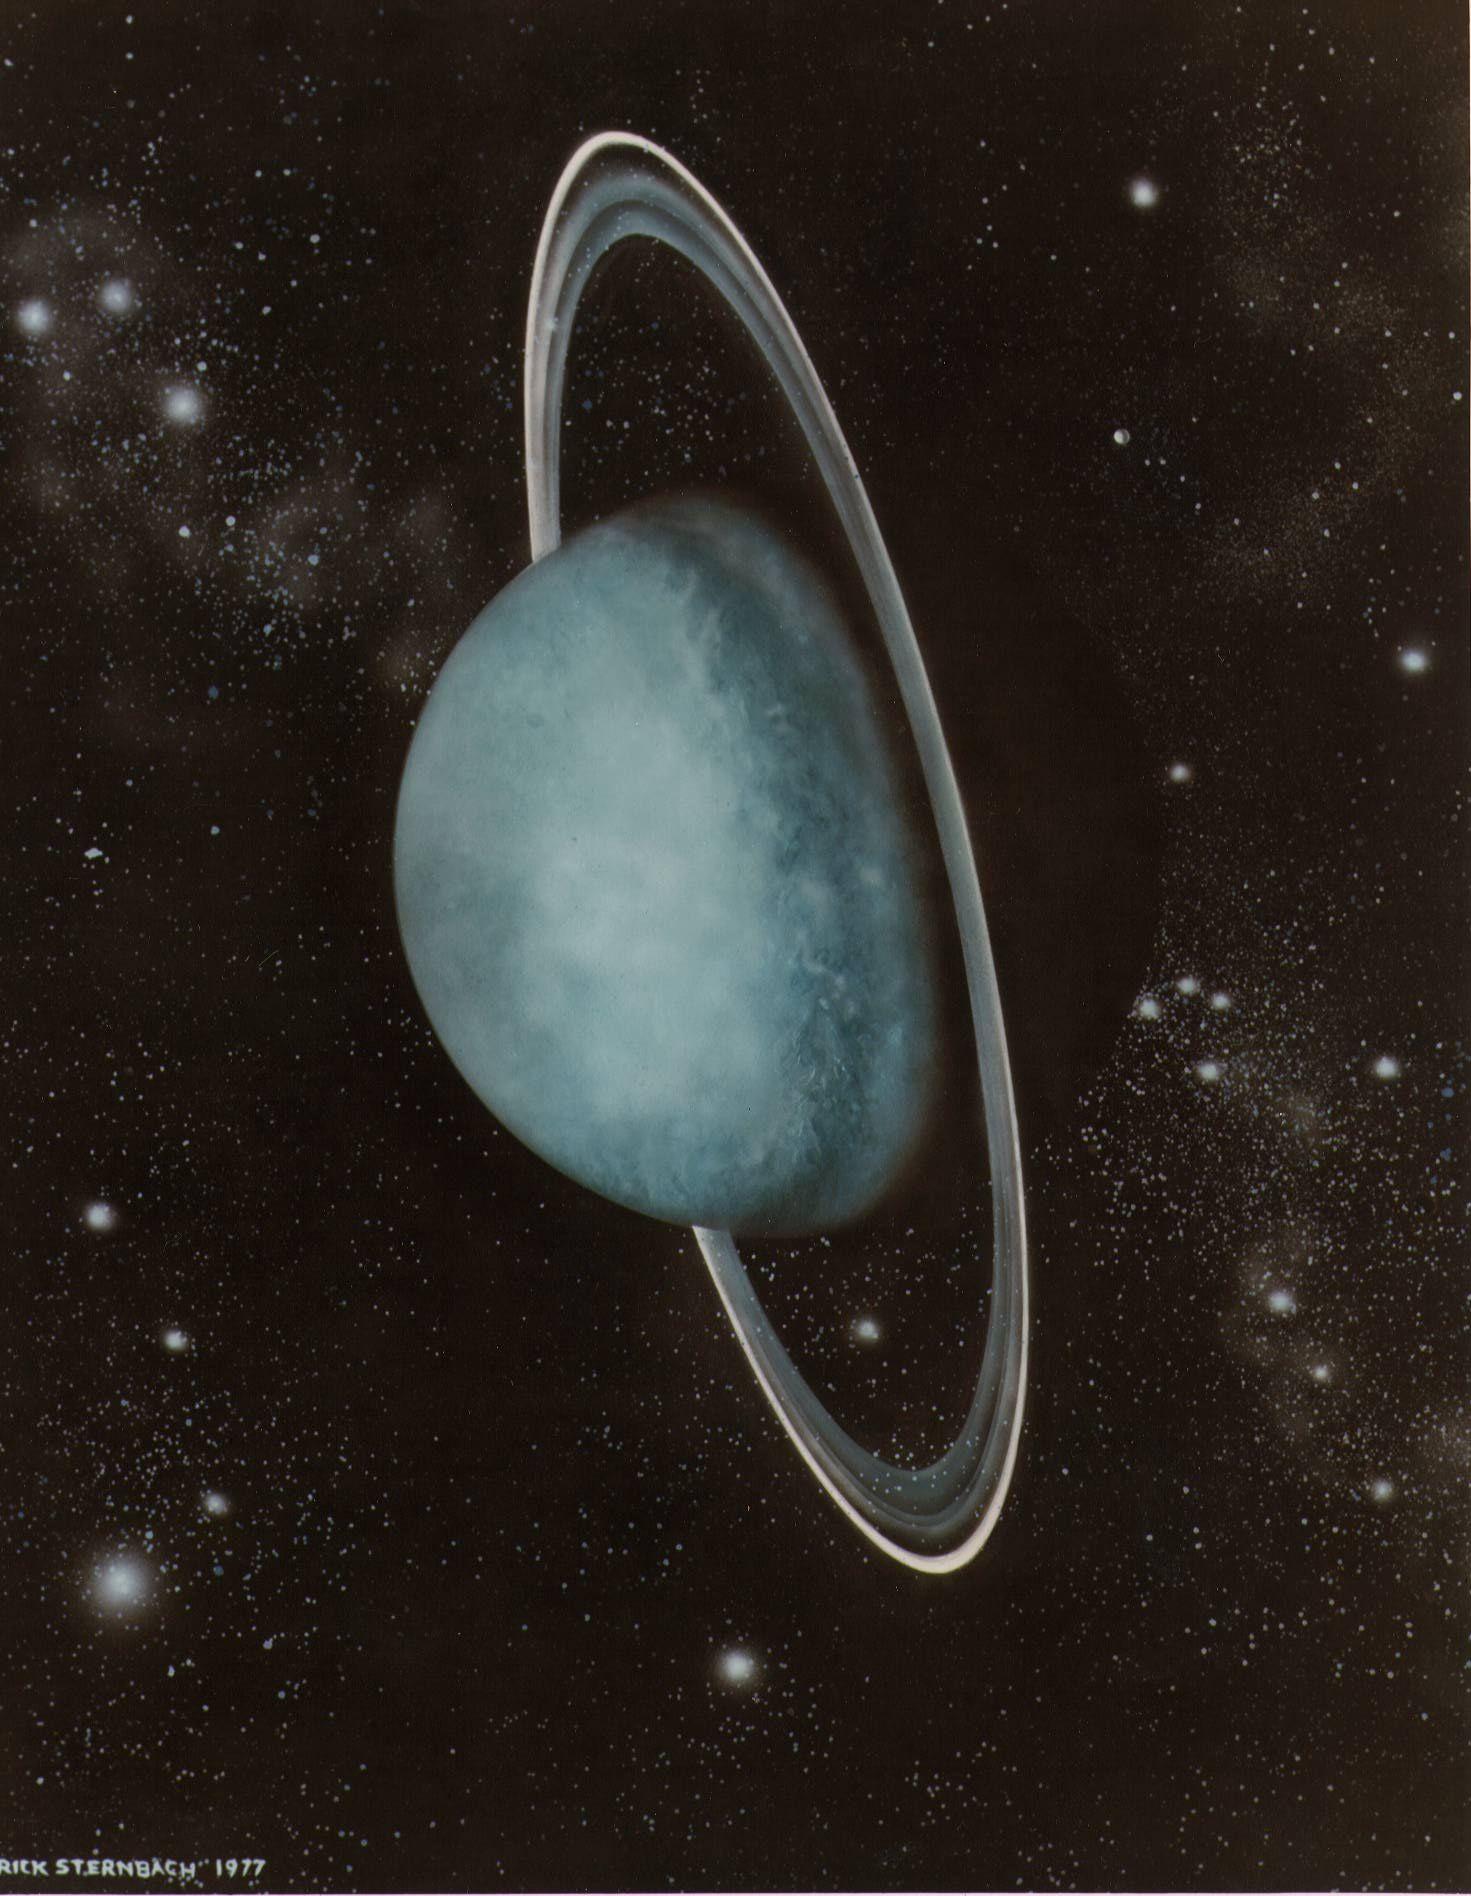 Planet+Uranus | planets stars moons other asteroids faq ...